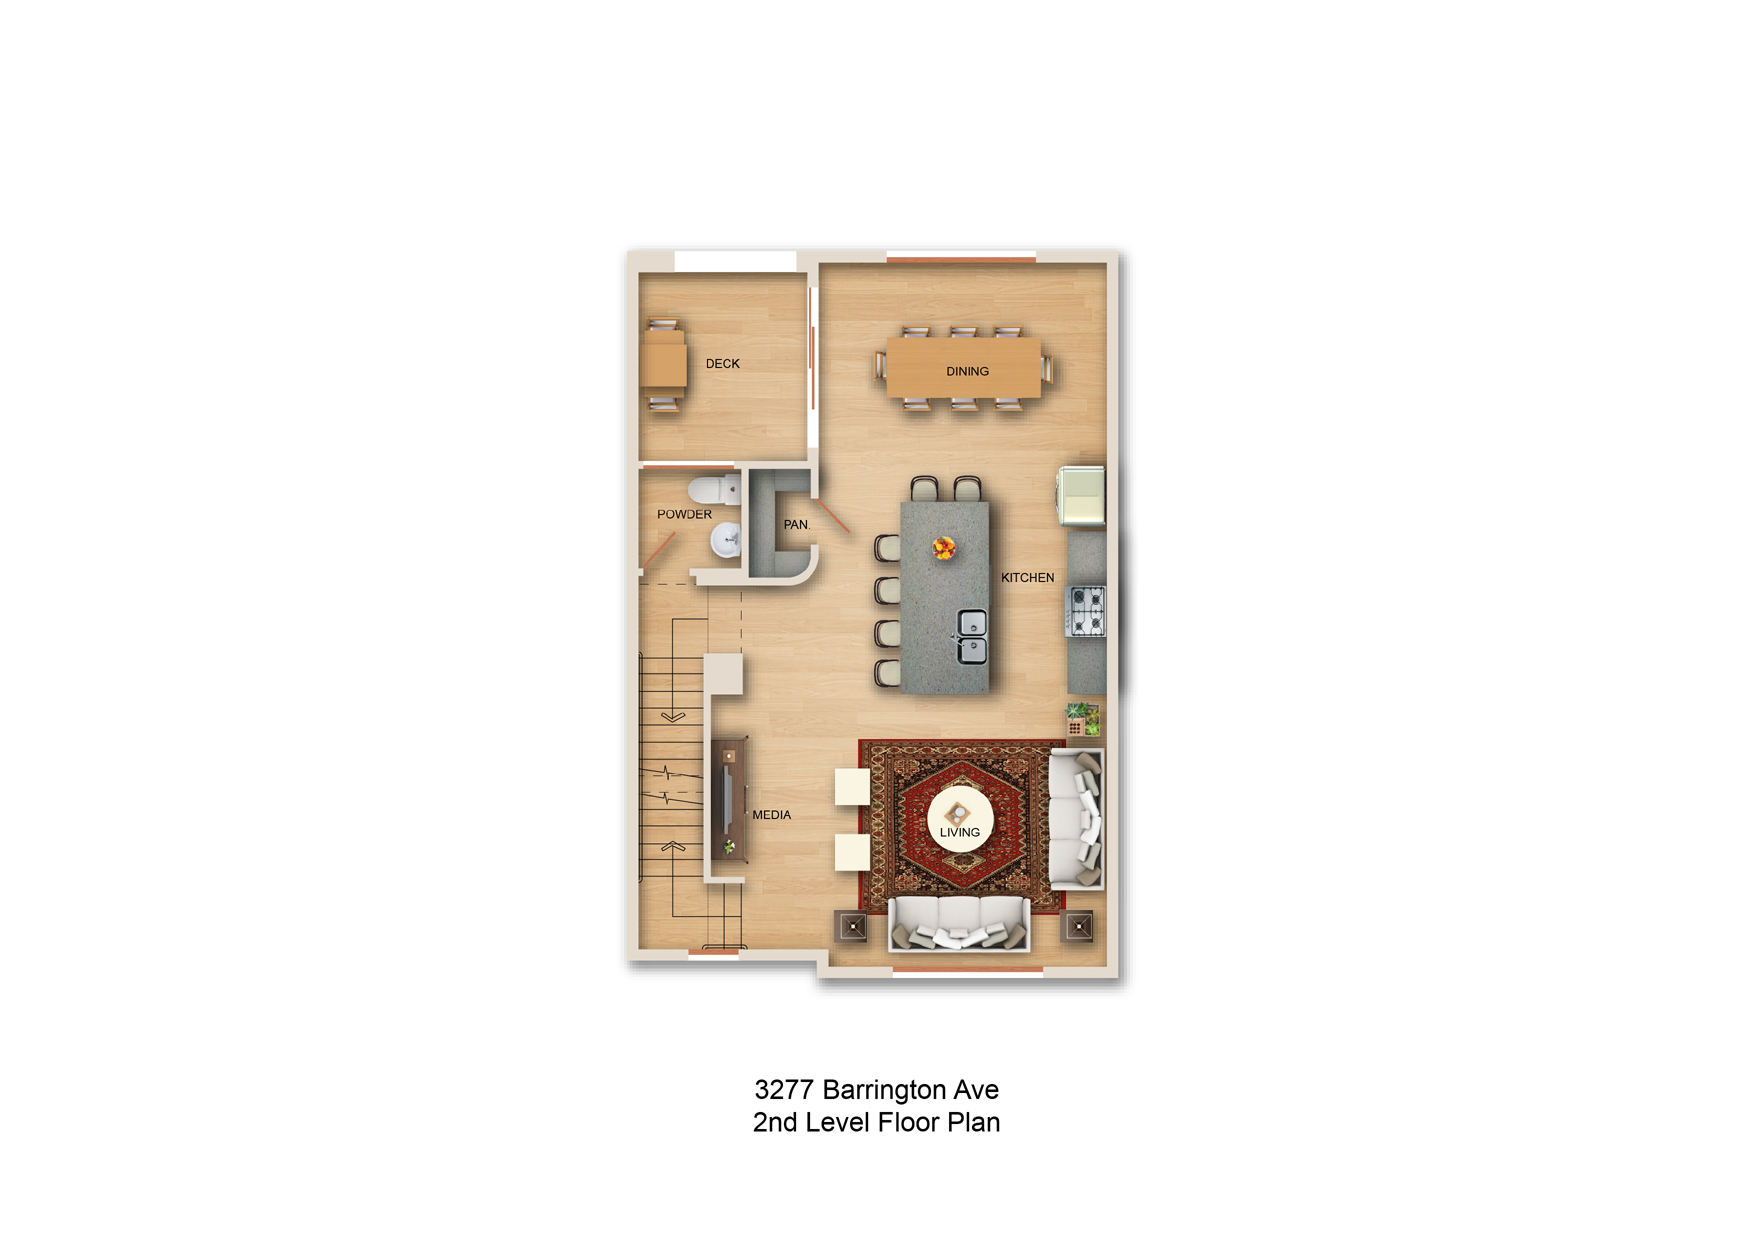 3277-Barrington-Ave-2nd-Level-Floor-Plan-Web.jpg